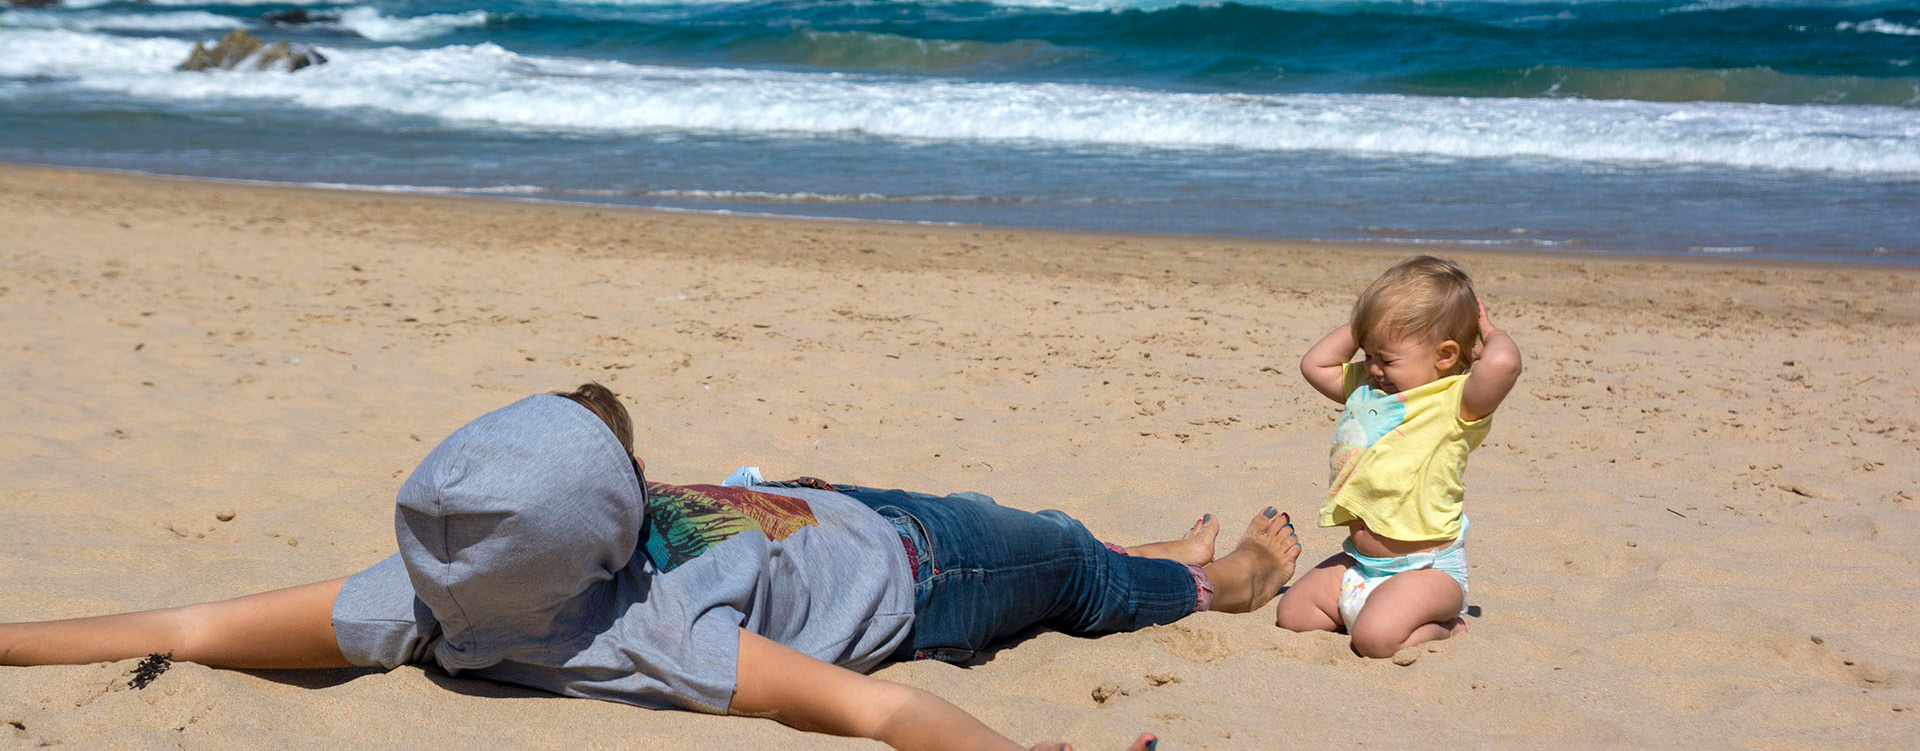 RPA - plaża